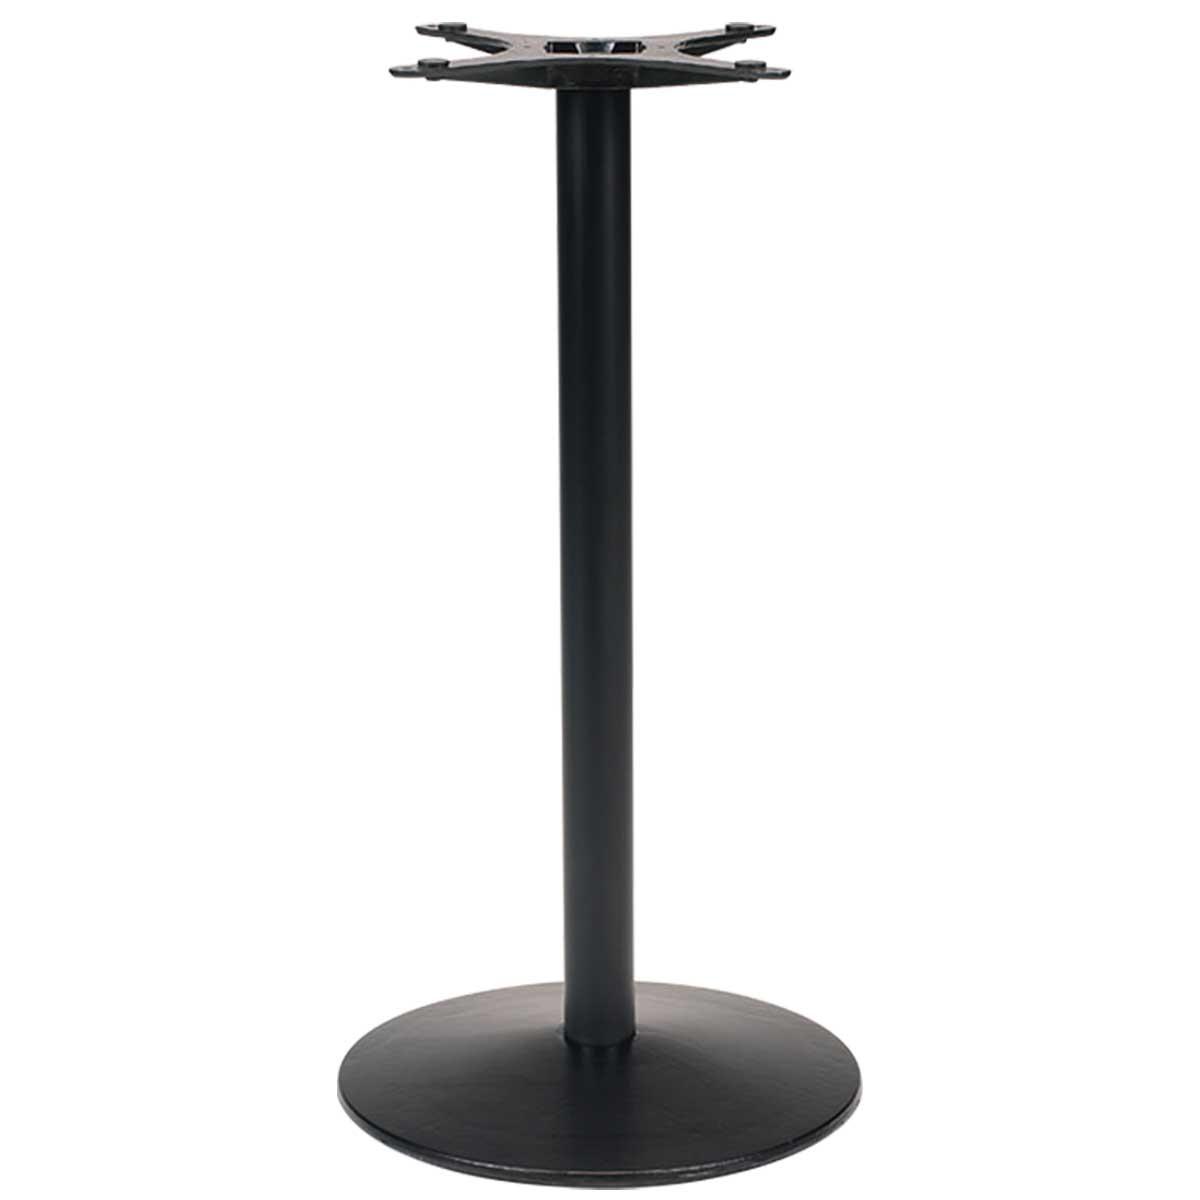 ronda55 MD noir - https://www.werzalit.com/nl/product/ronda-55-md/